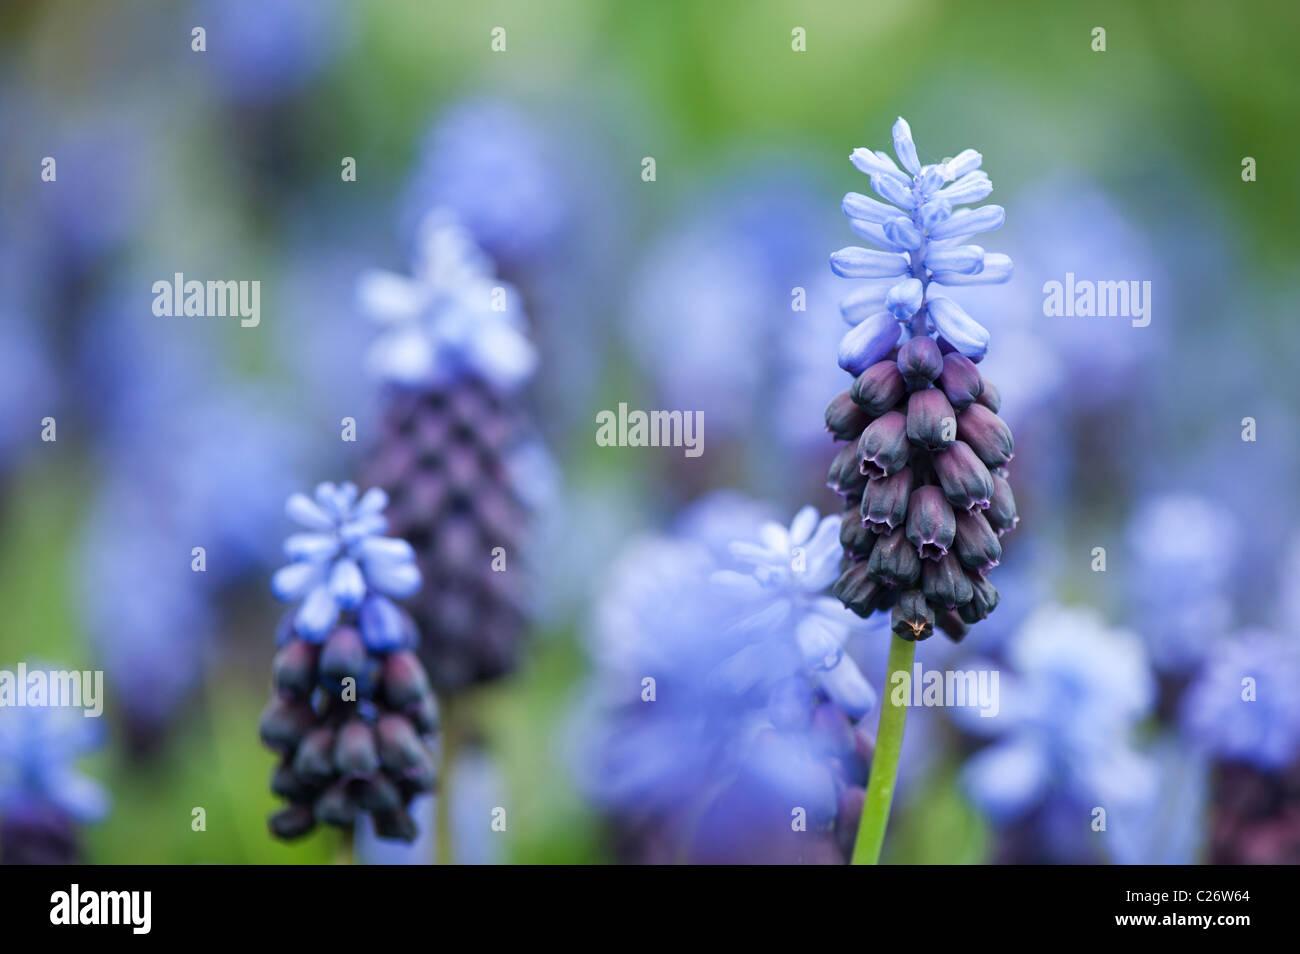 Muscari latifolium. Broad Leaved Grape Hyacinth flowers - Stock Image